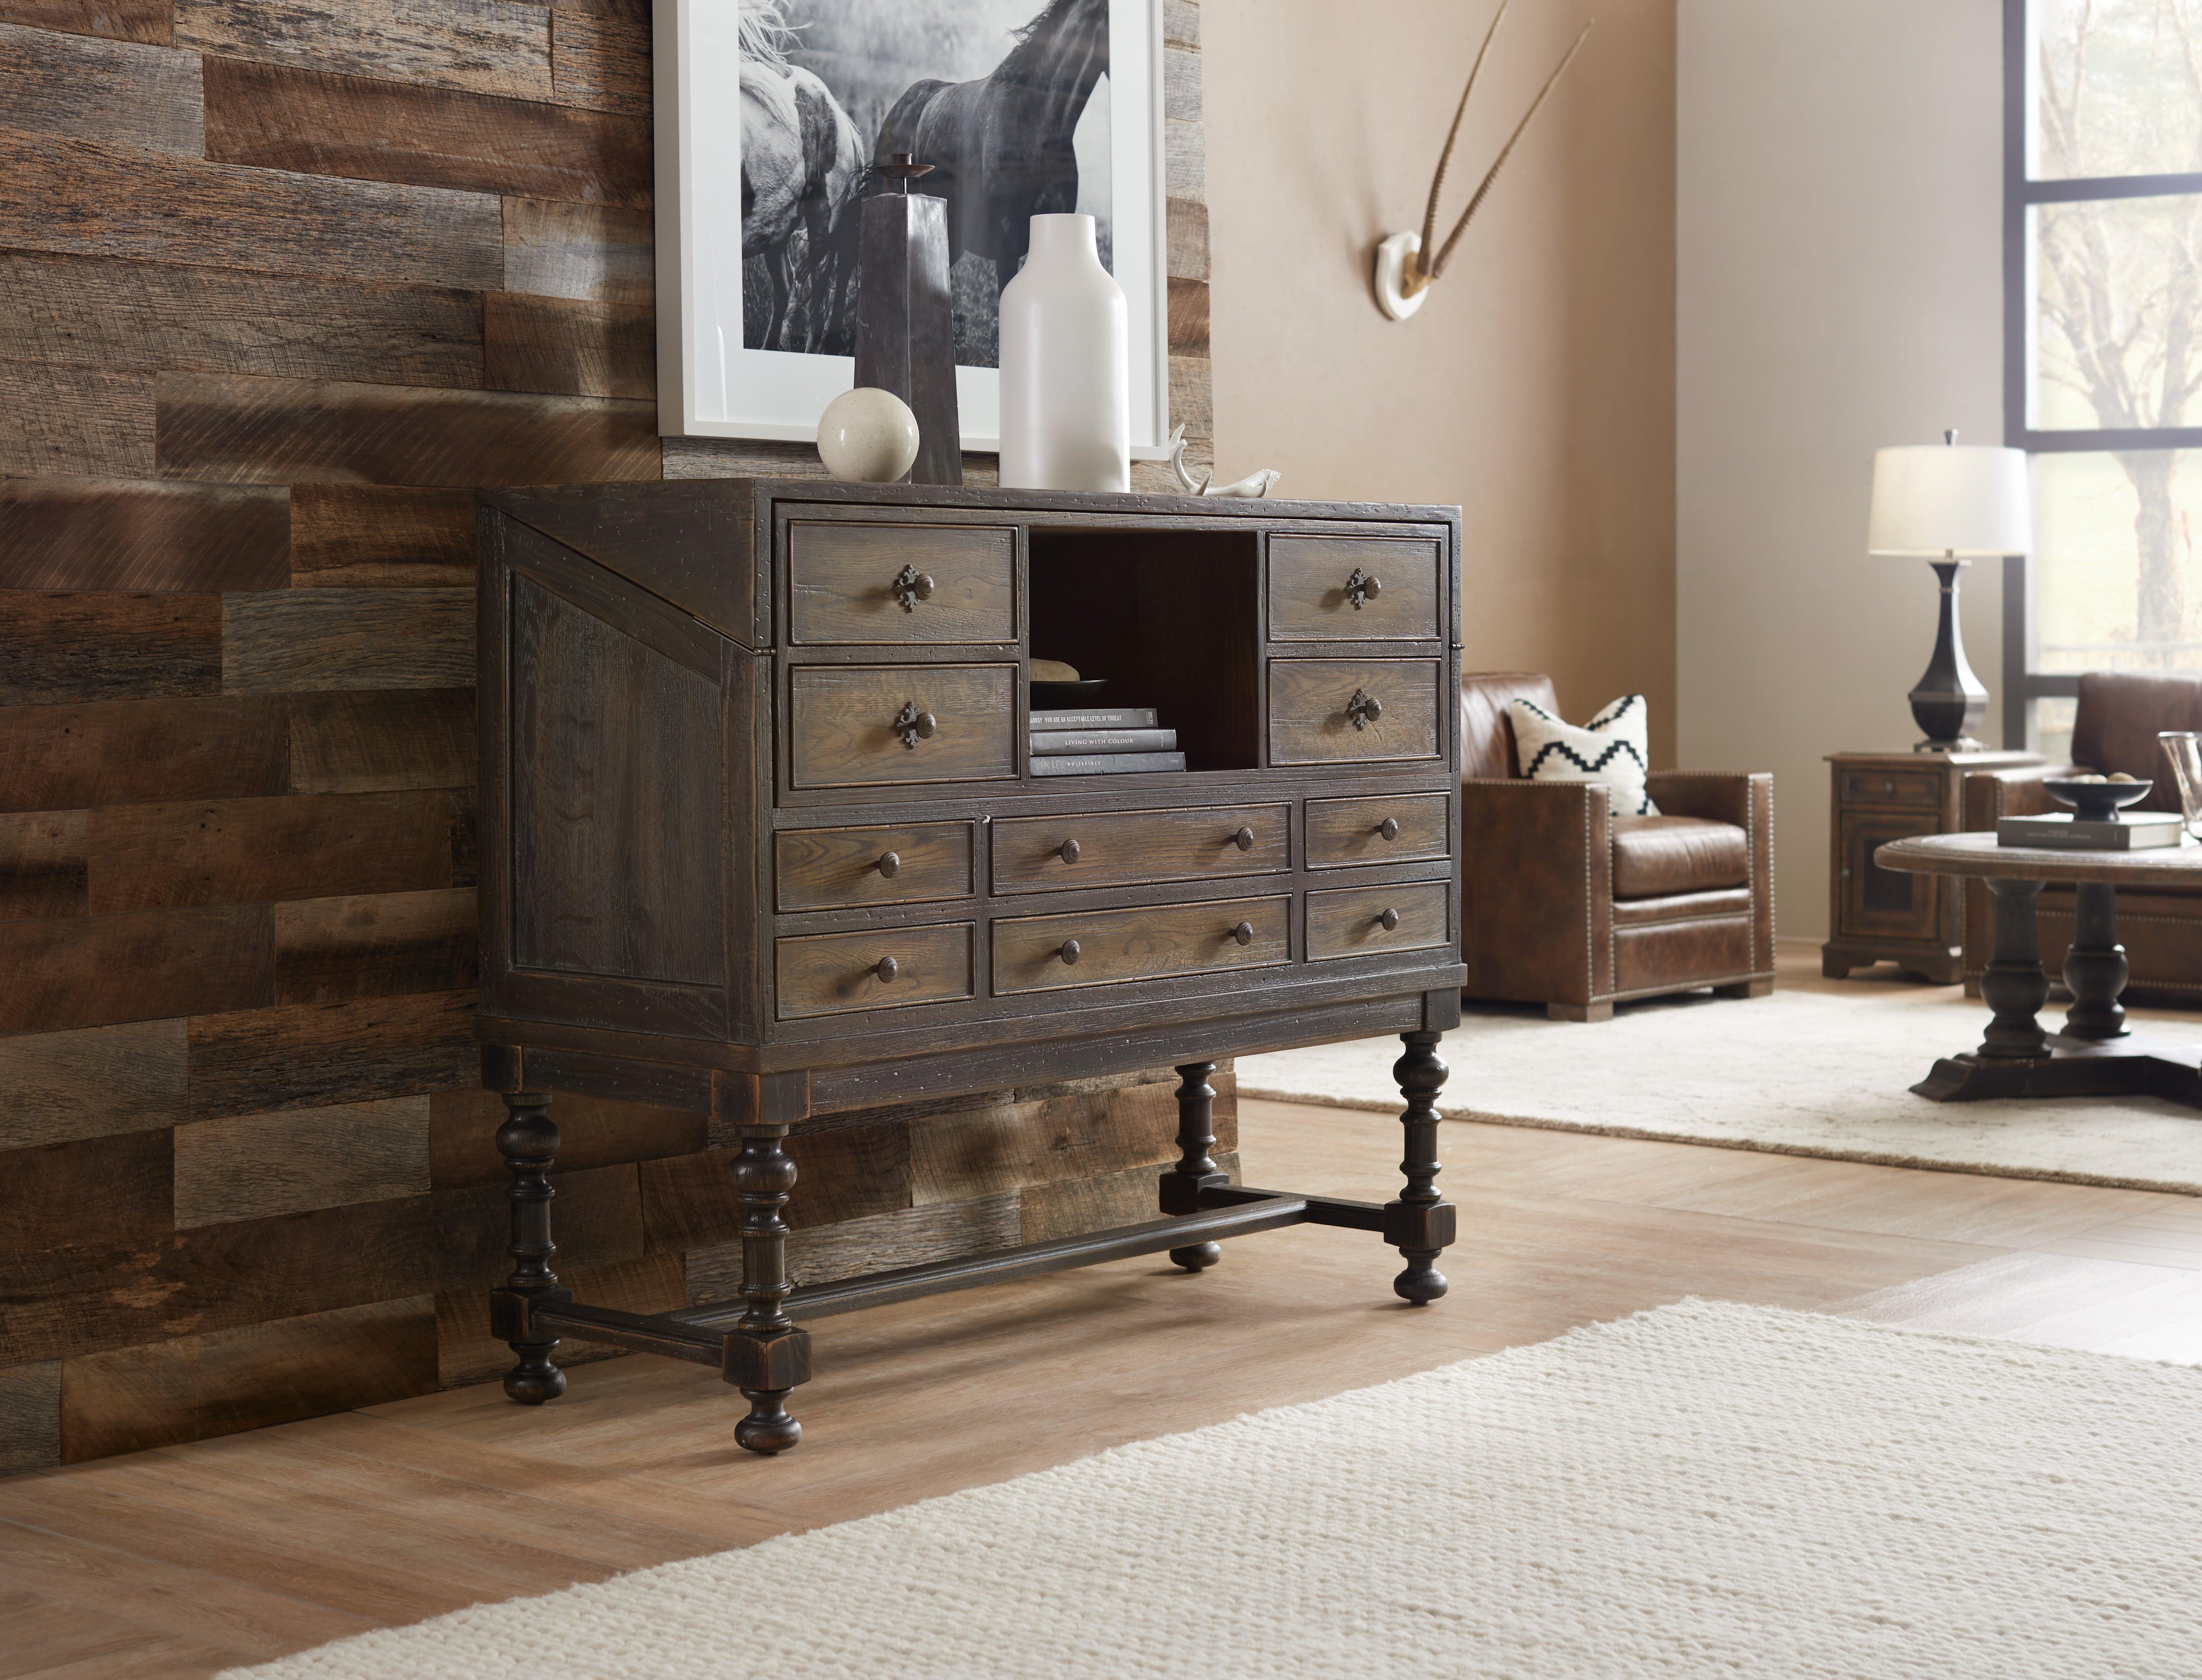 La Credenza Supplier : Hooker furniture hill country boerne ranch managers credenza desk